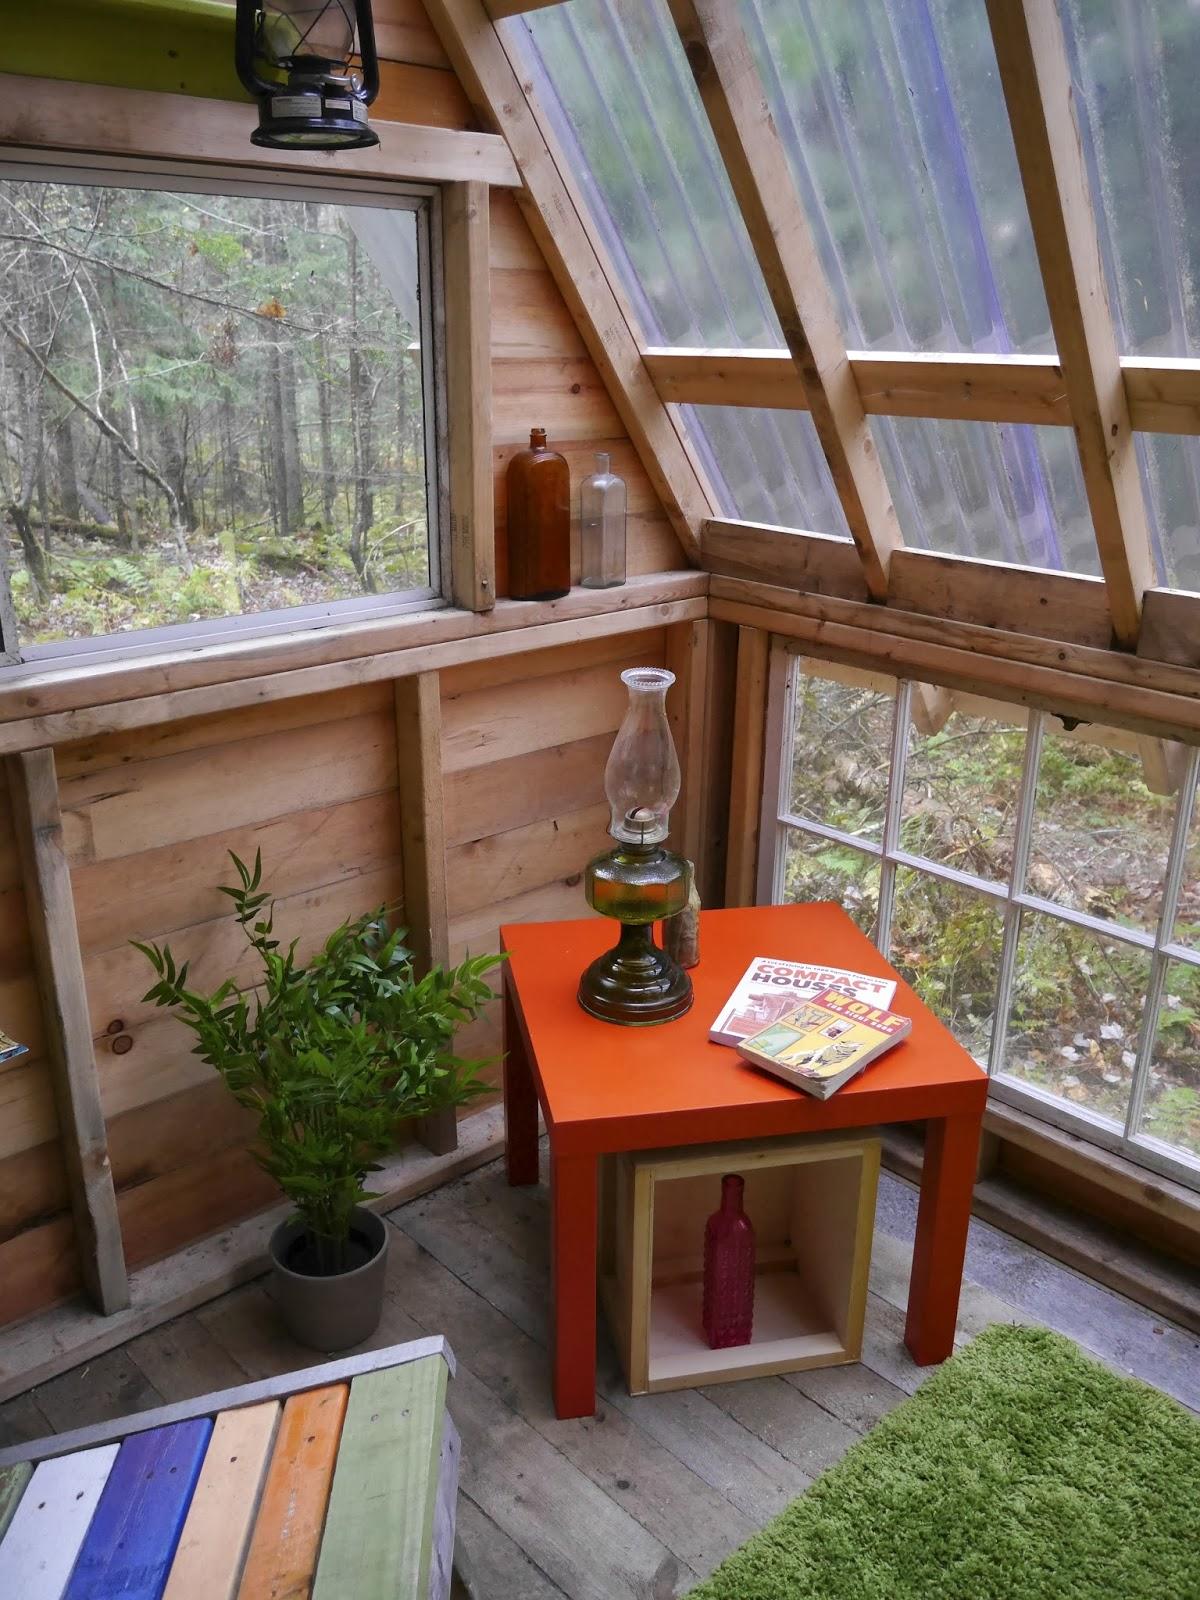 Sixteen tiny houses a frames huts art for Tiny house photo gallery